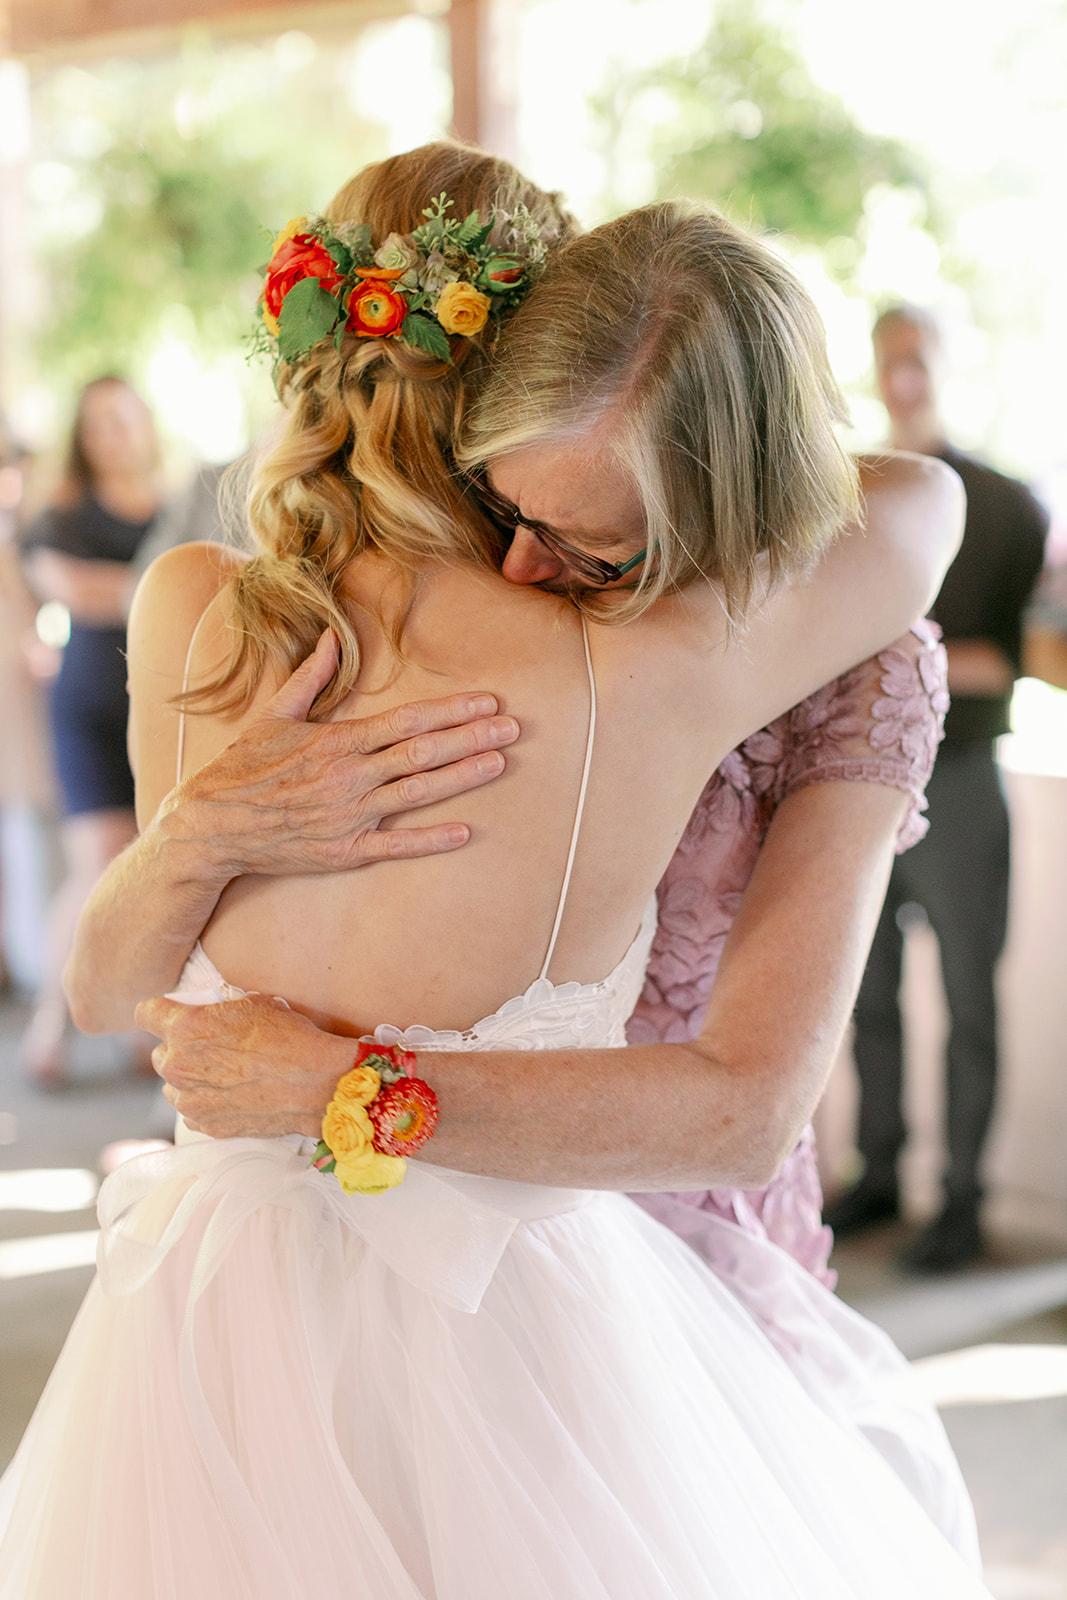 2019 Bryan + Amanda Wedding - 609.jpg